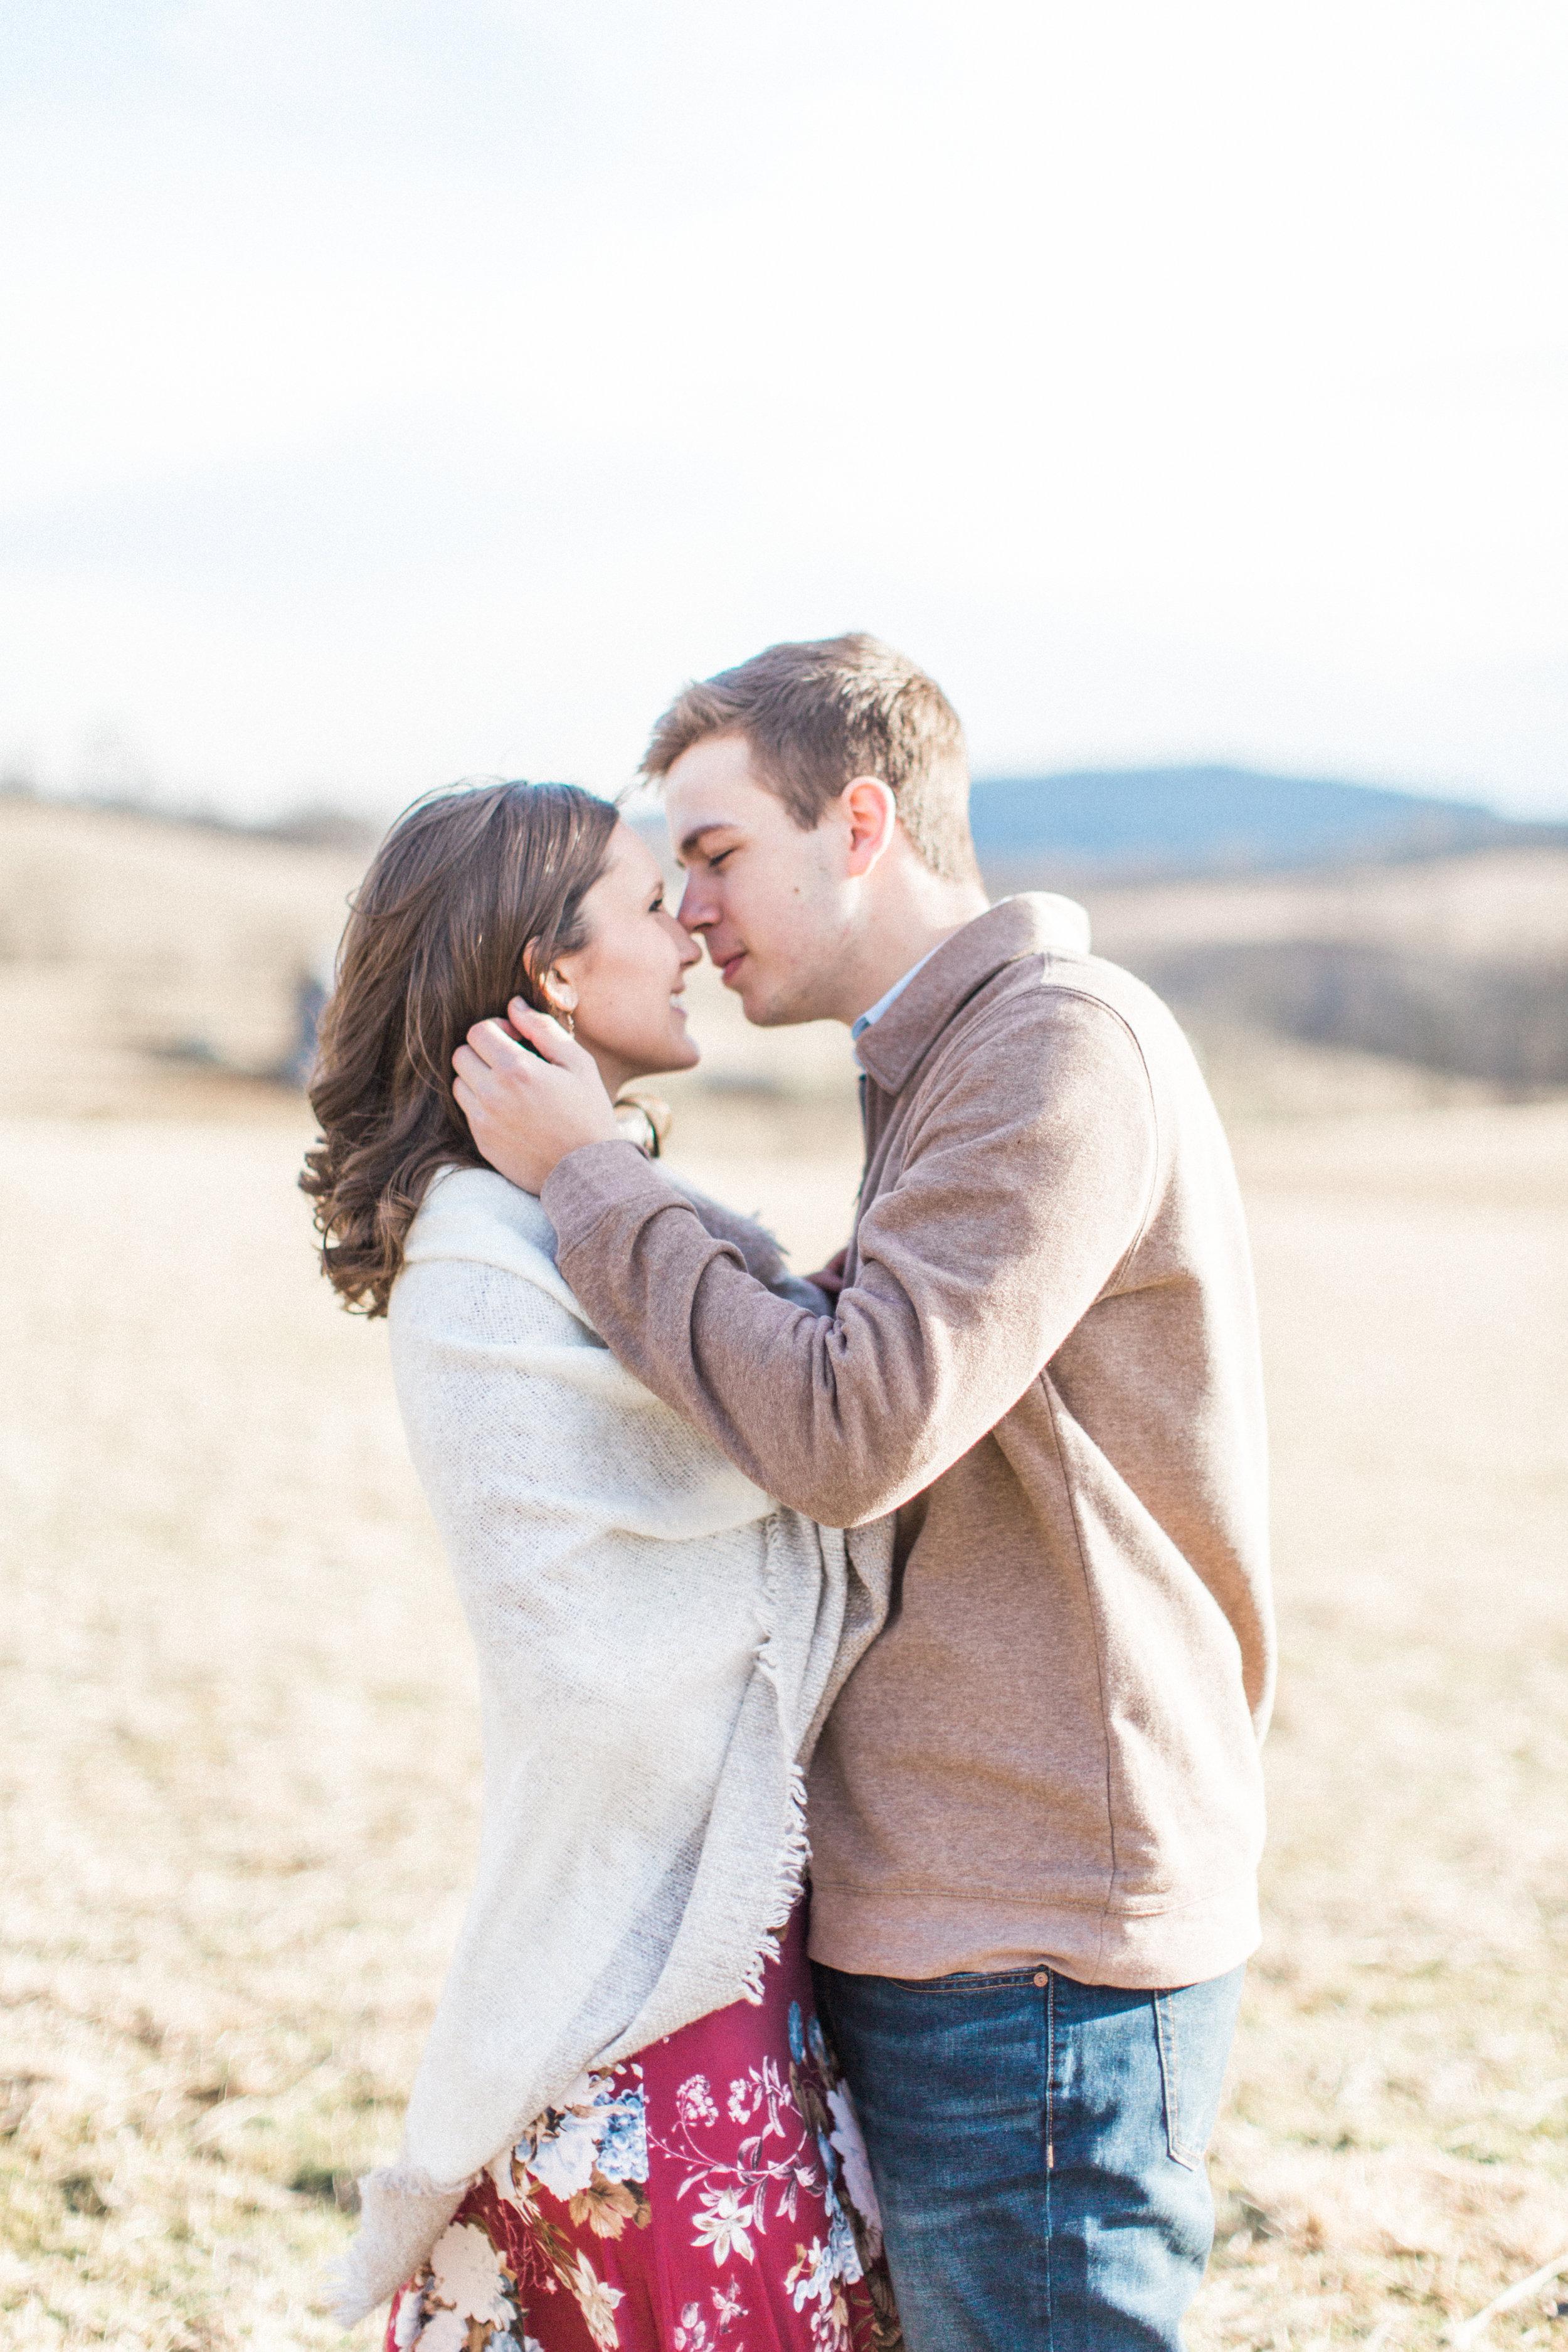 Abigail_Jill_Photography_Maryland_Engagement_Farm_Emily_Justin204.jpg